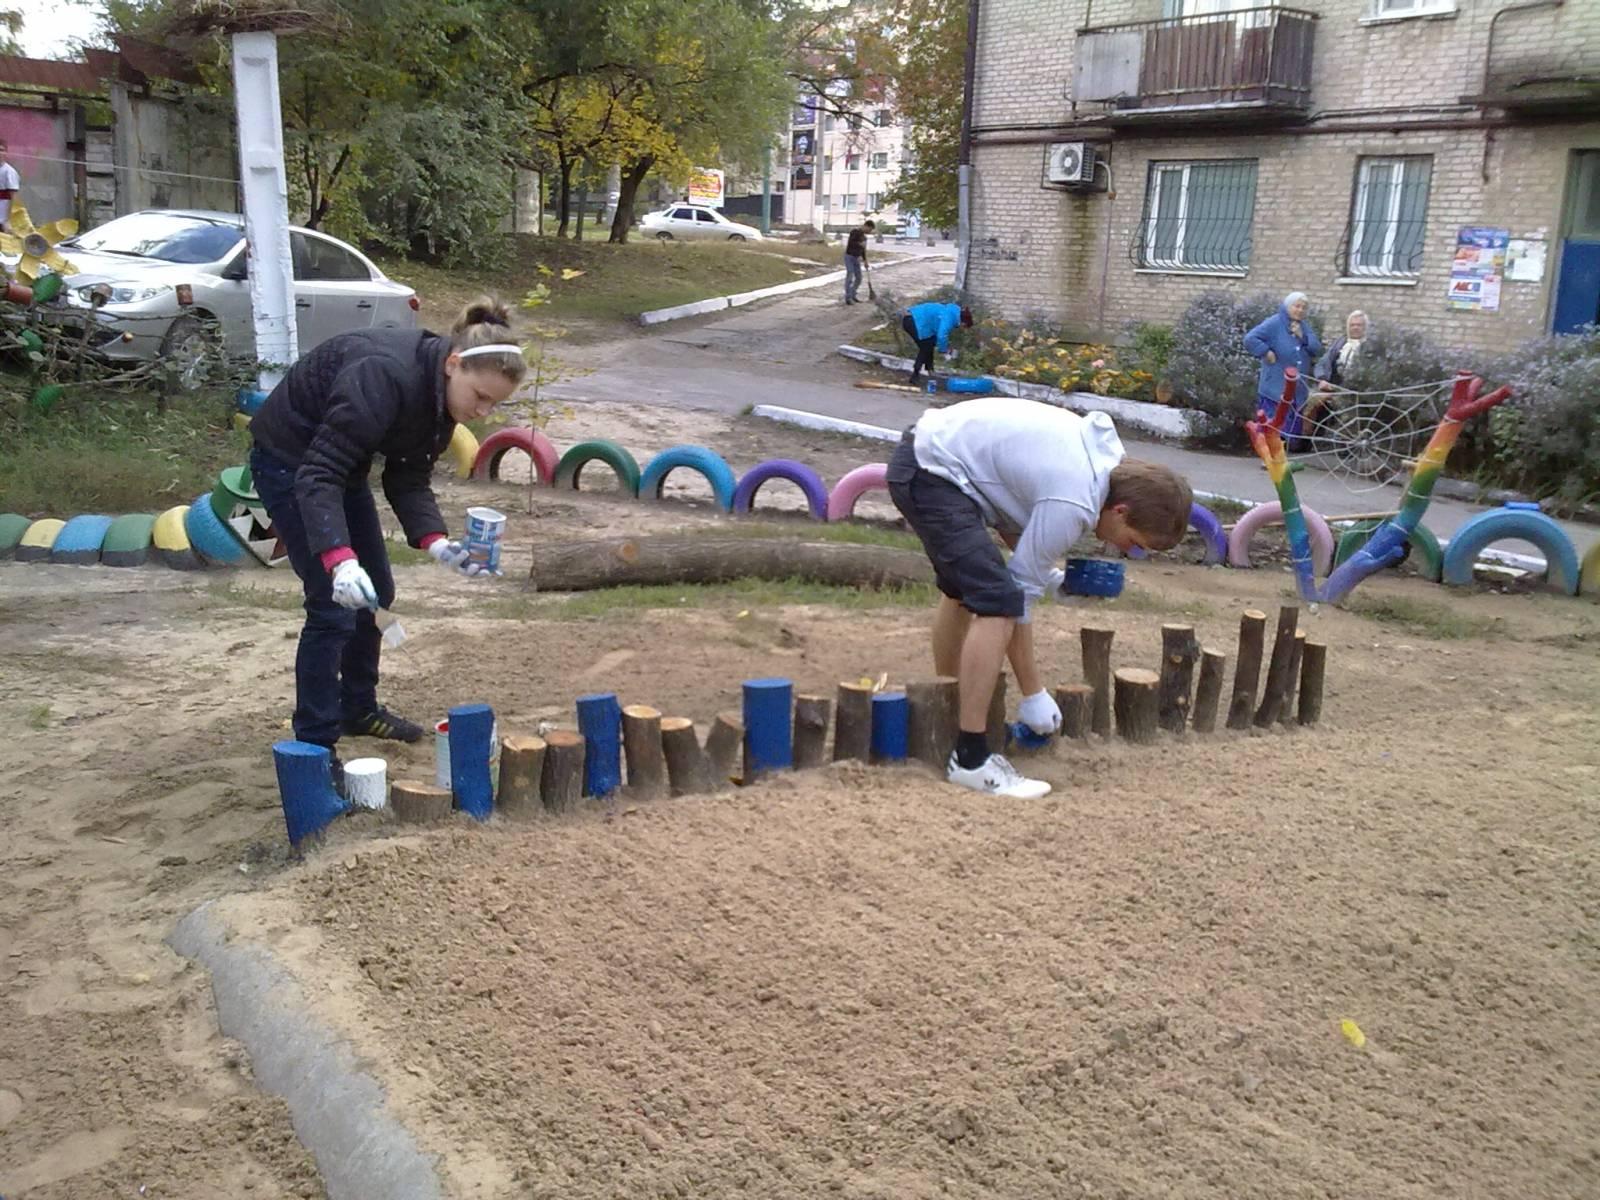 Детская площадка своими руками : фото-идеи